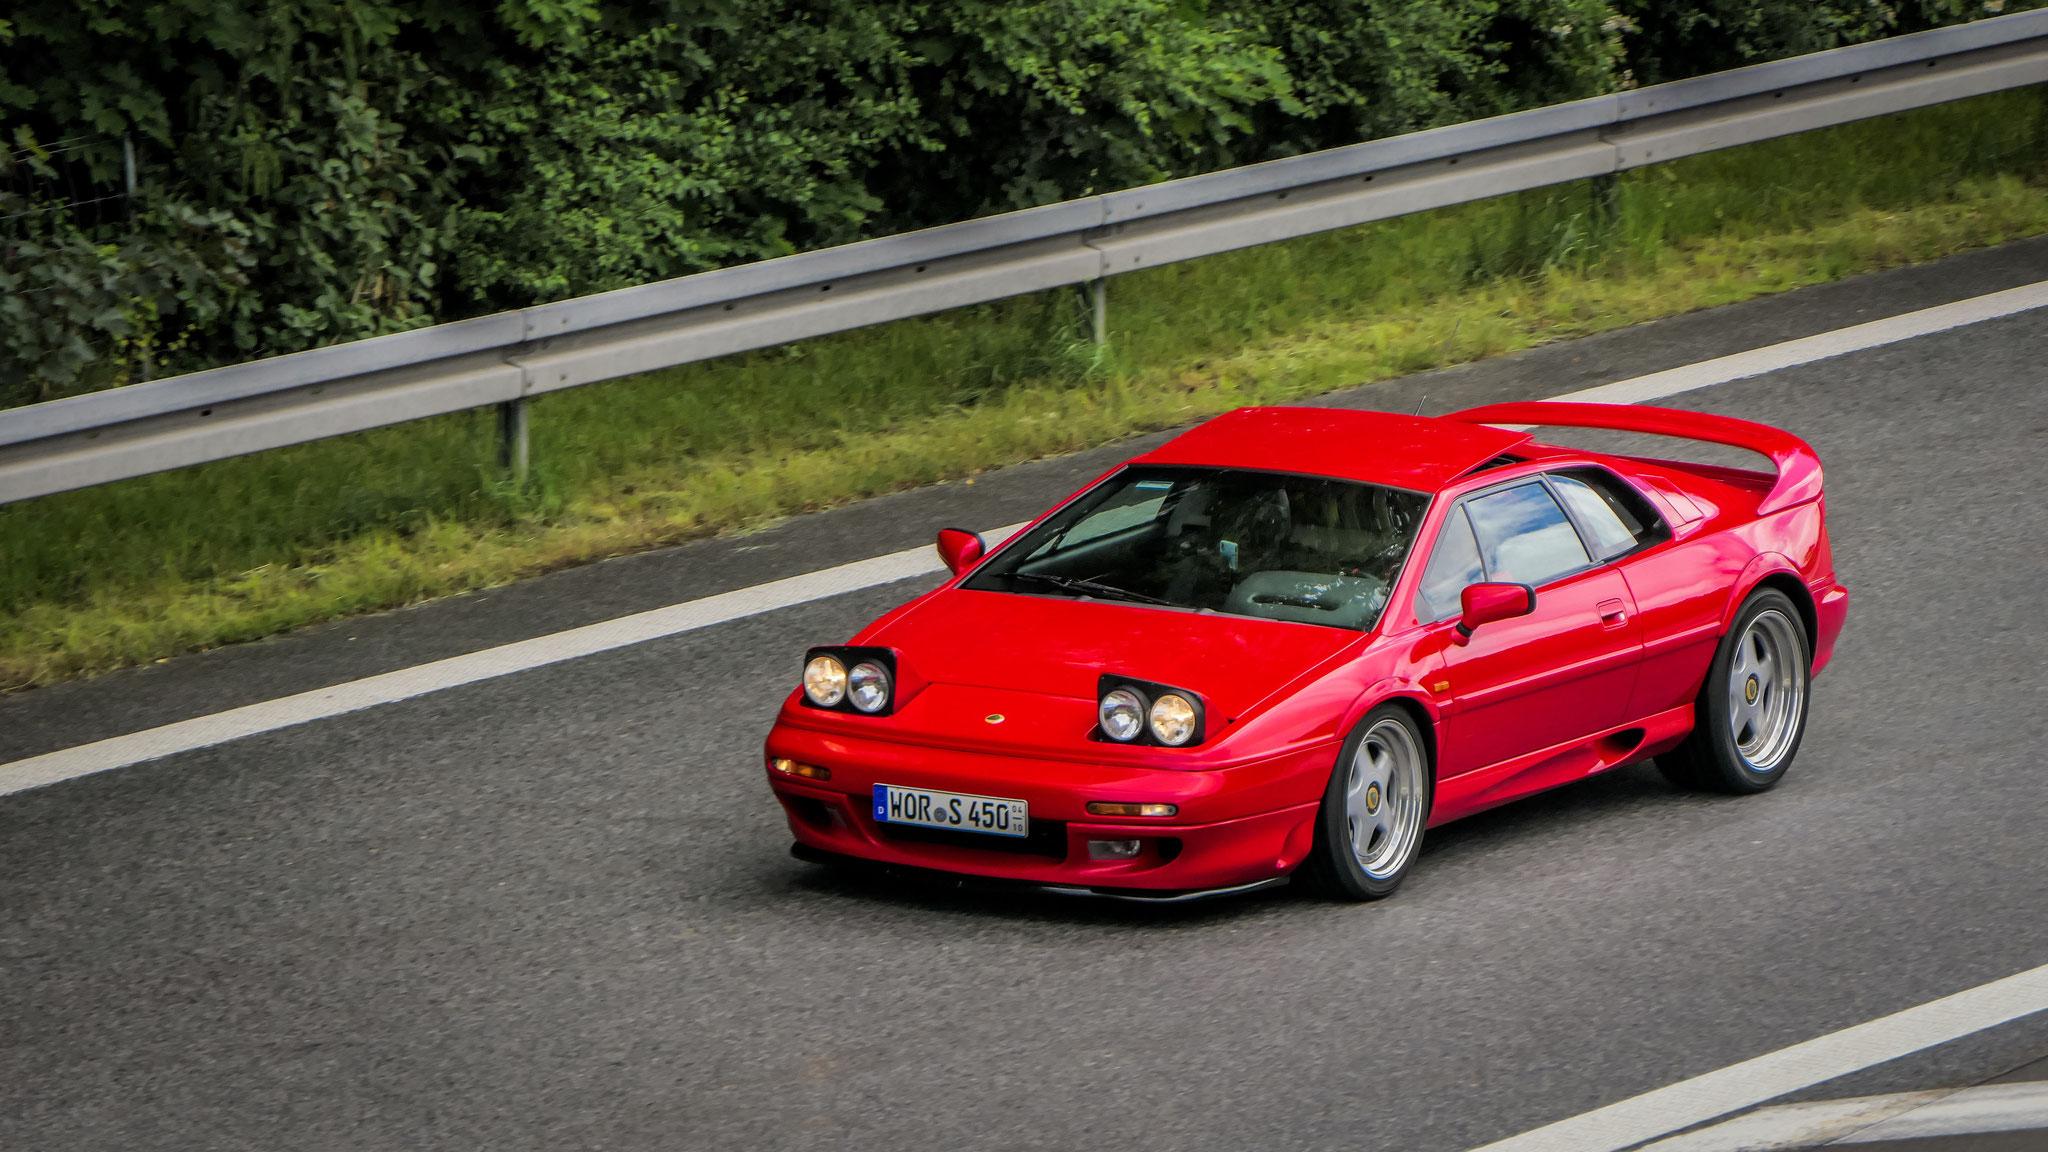 Lotus Esprit V8 - WOR-S-450